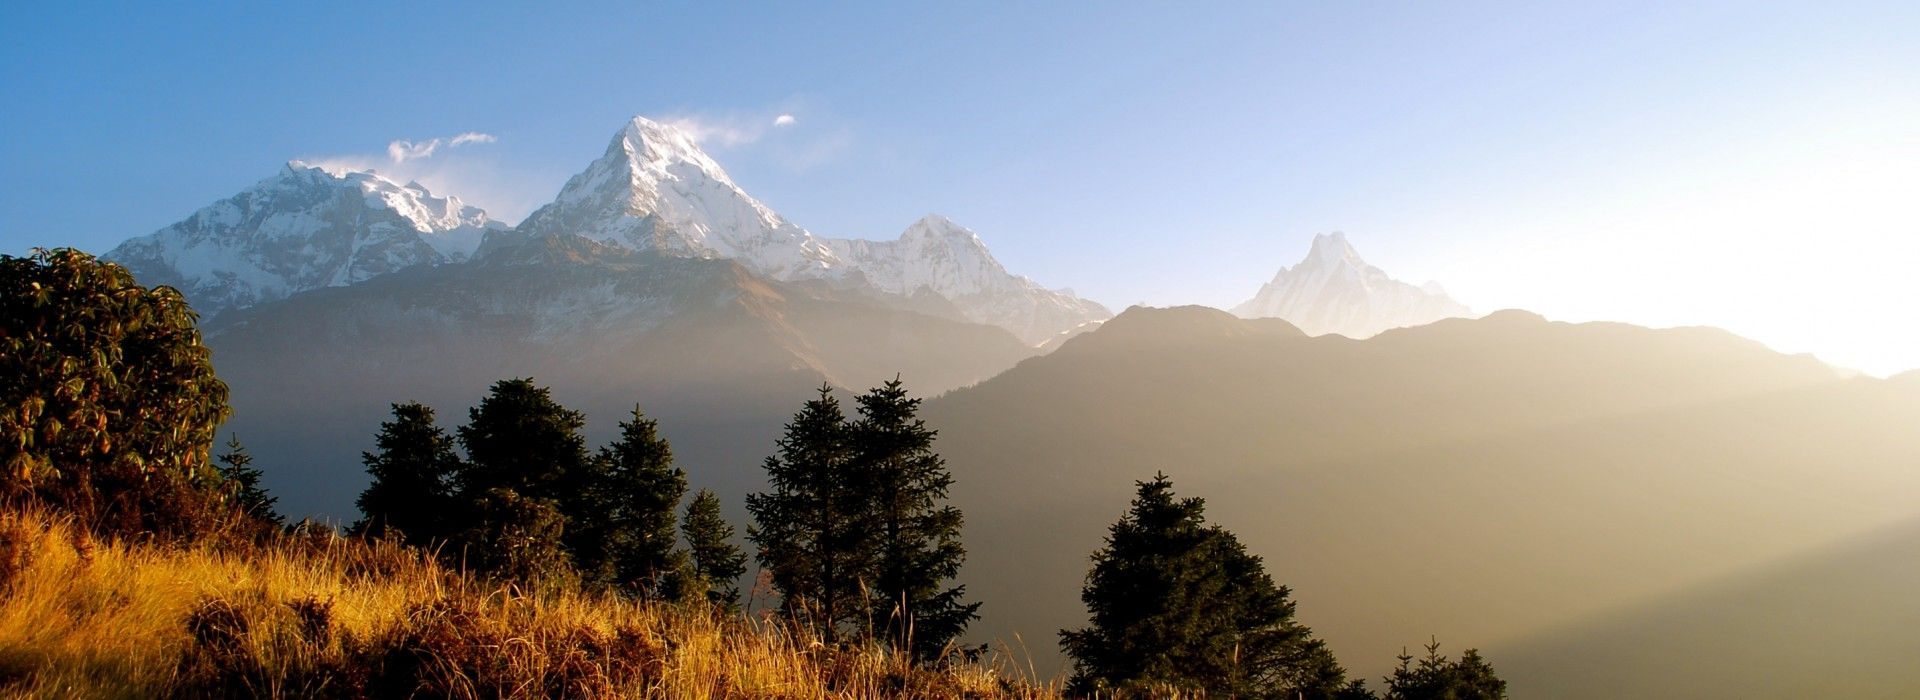 Mountain biking Tours in Asia